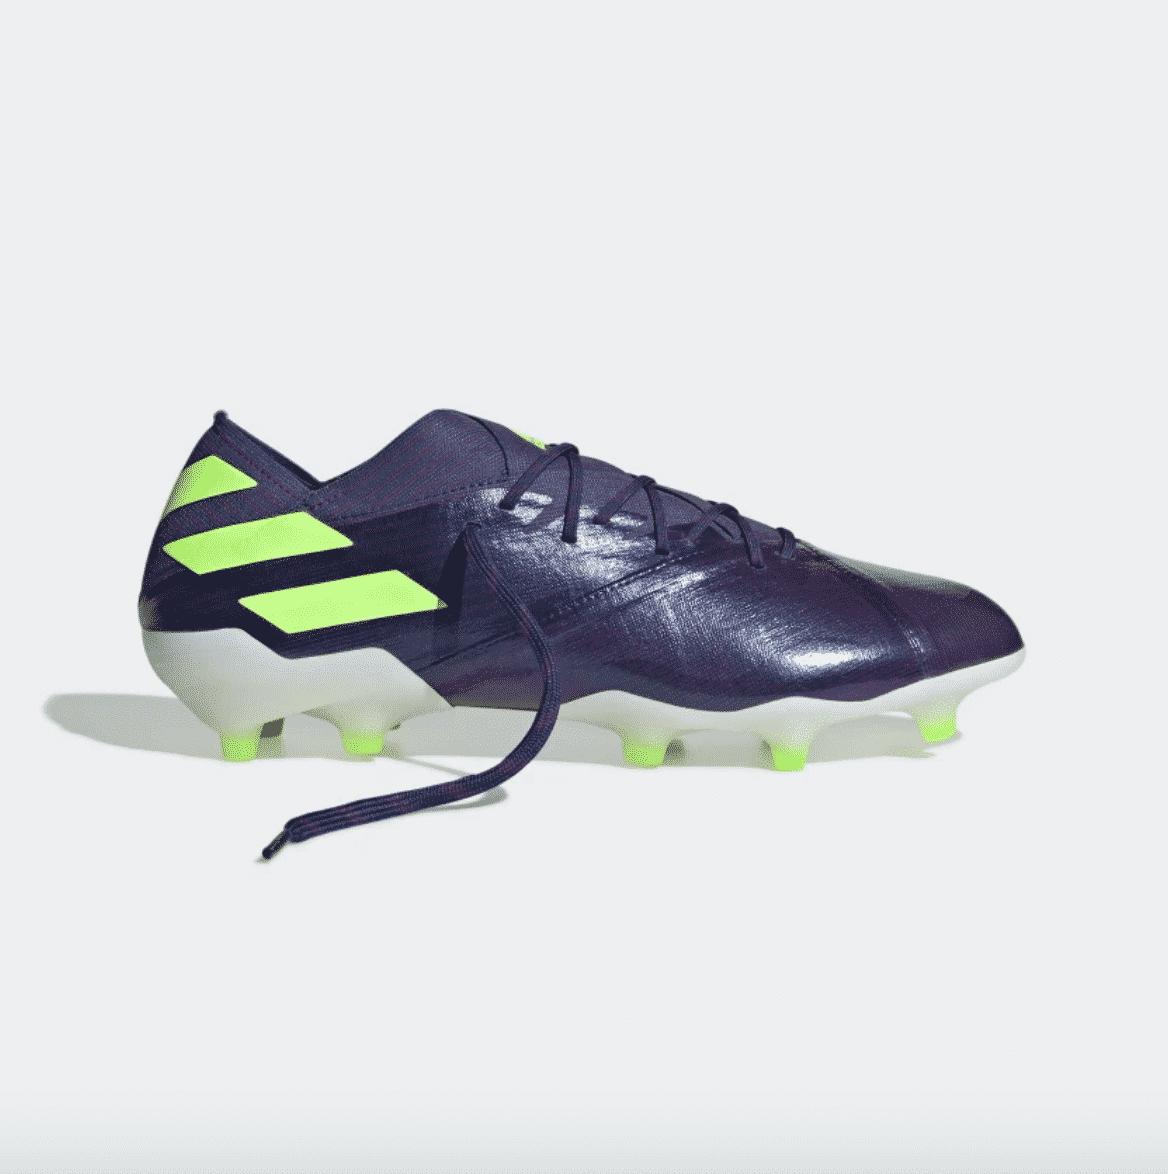 chaussures-adidas-nemeziz-19.1-lionel-messi-ballon-or-2019-8